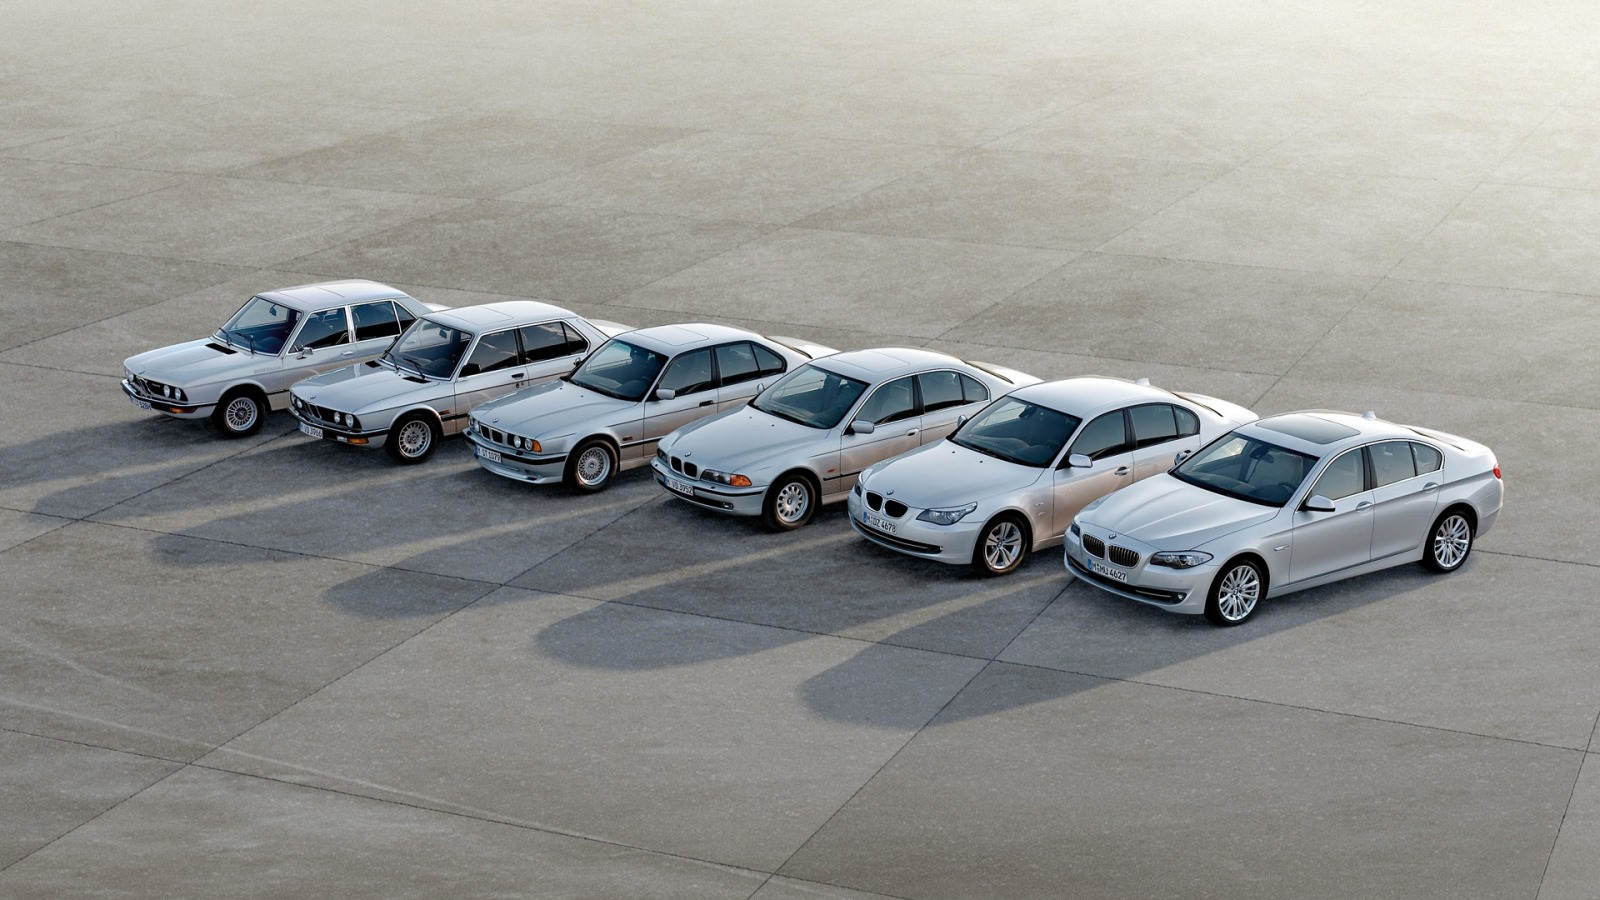 BMW 5 Series Wallpaper BMW Cars Wallpapers in jpg format ...